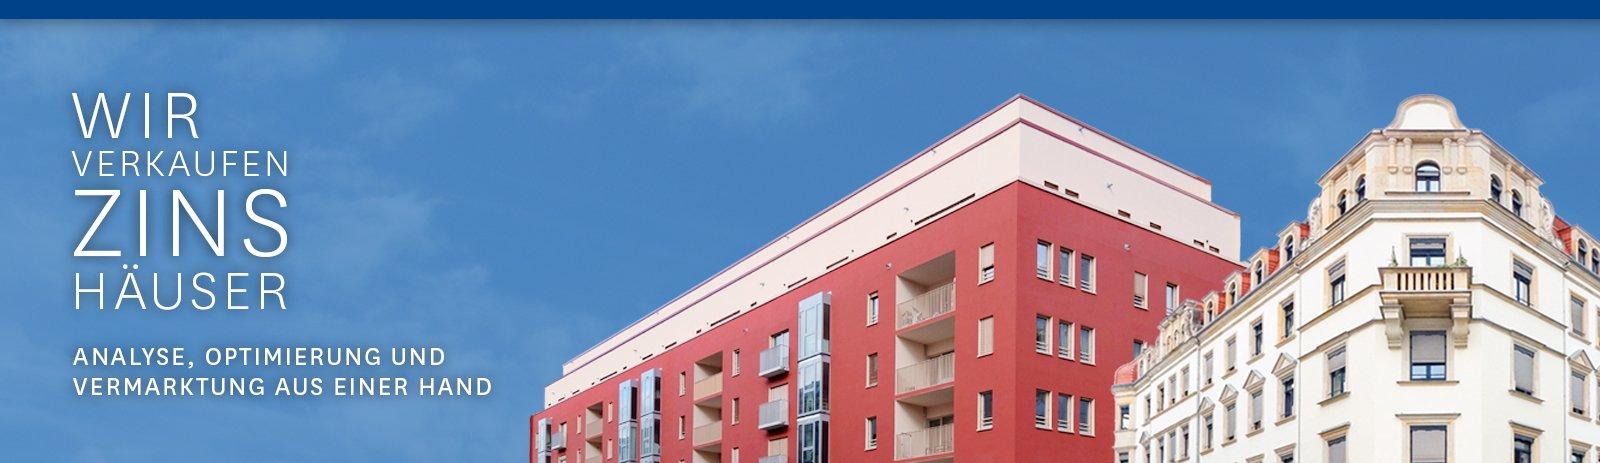 Zinshaus Immobilien in Dresden kaufen